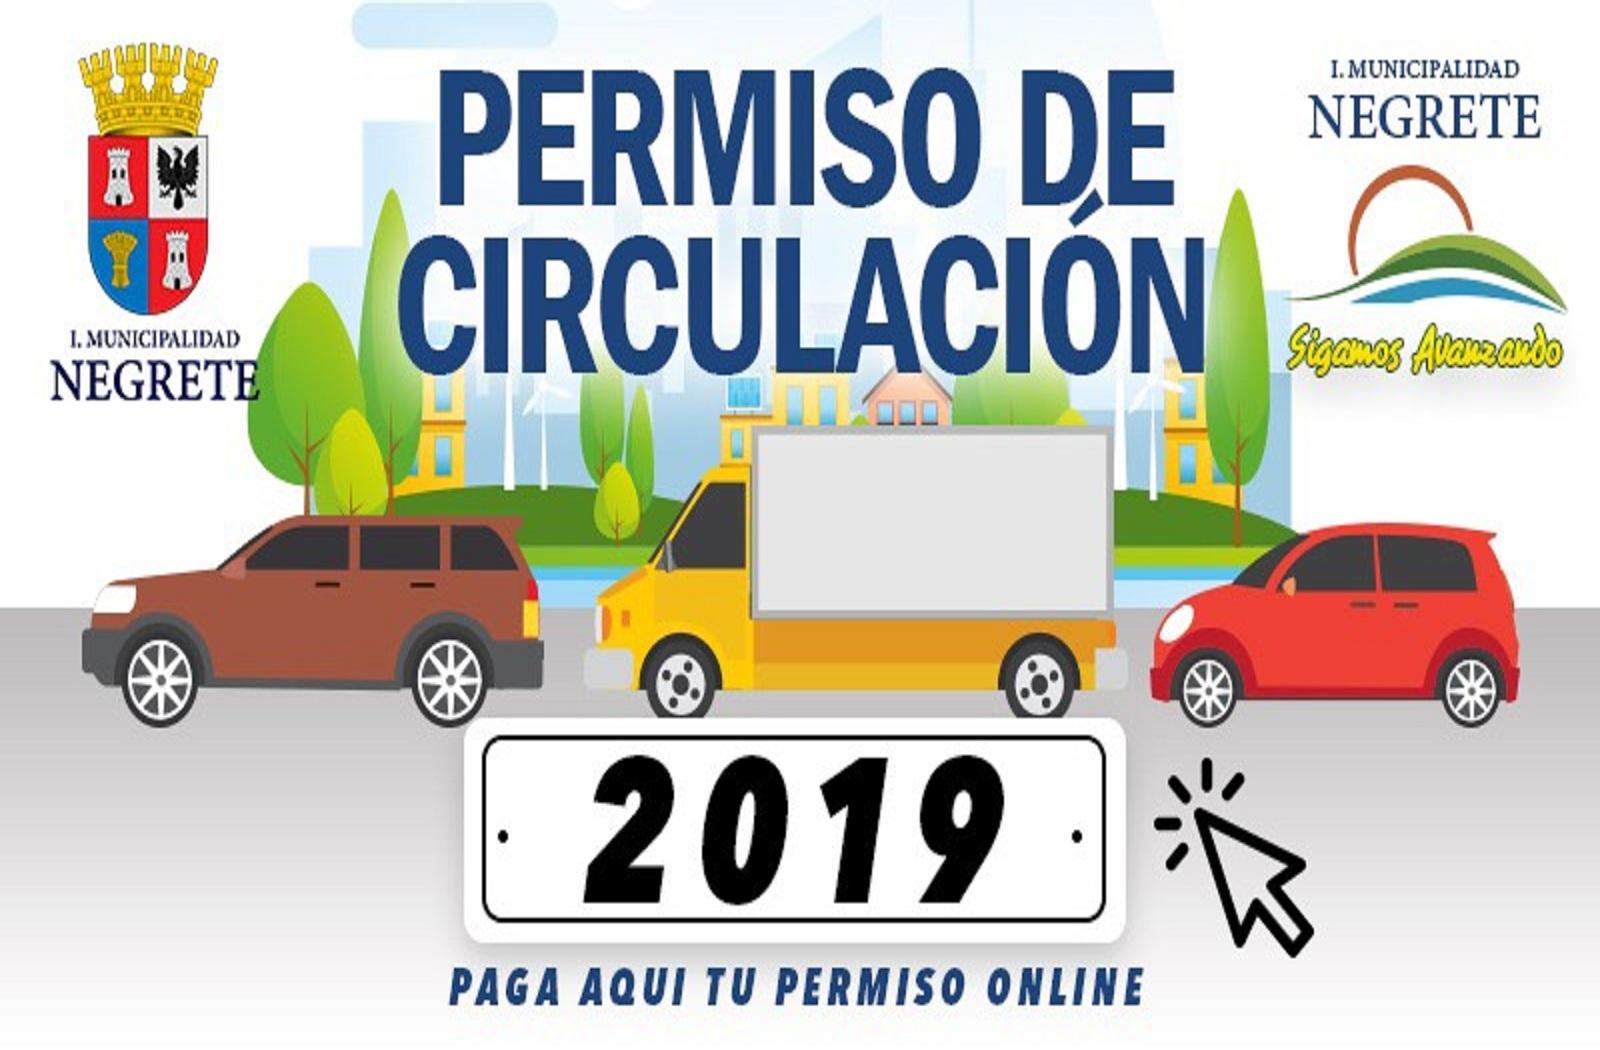 Permiso de circulación 2019